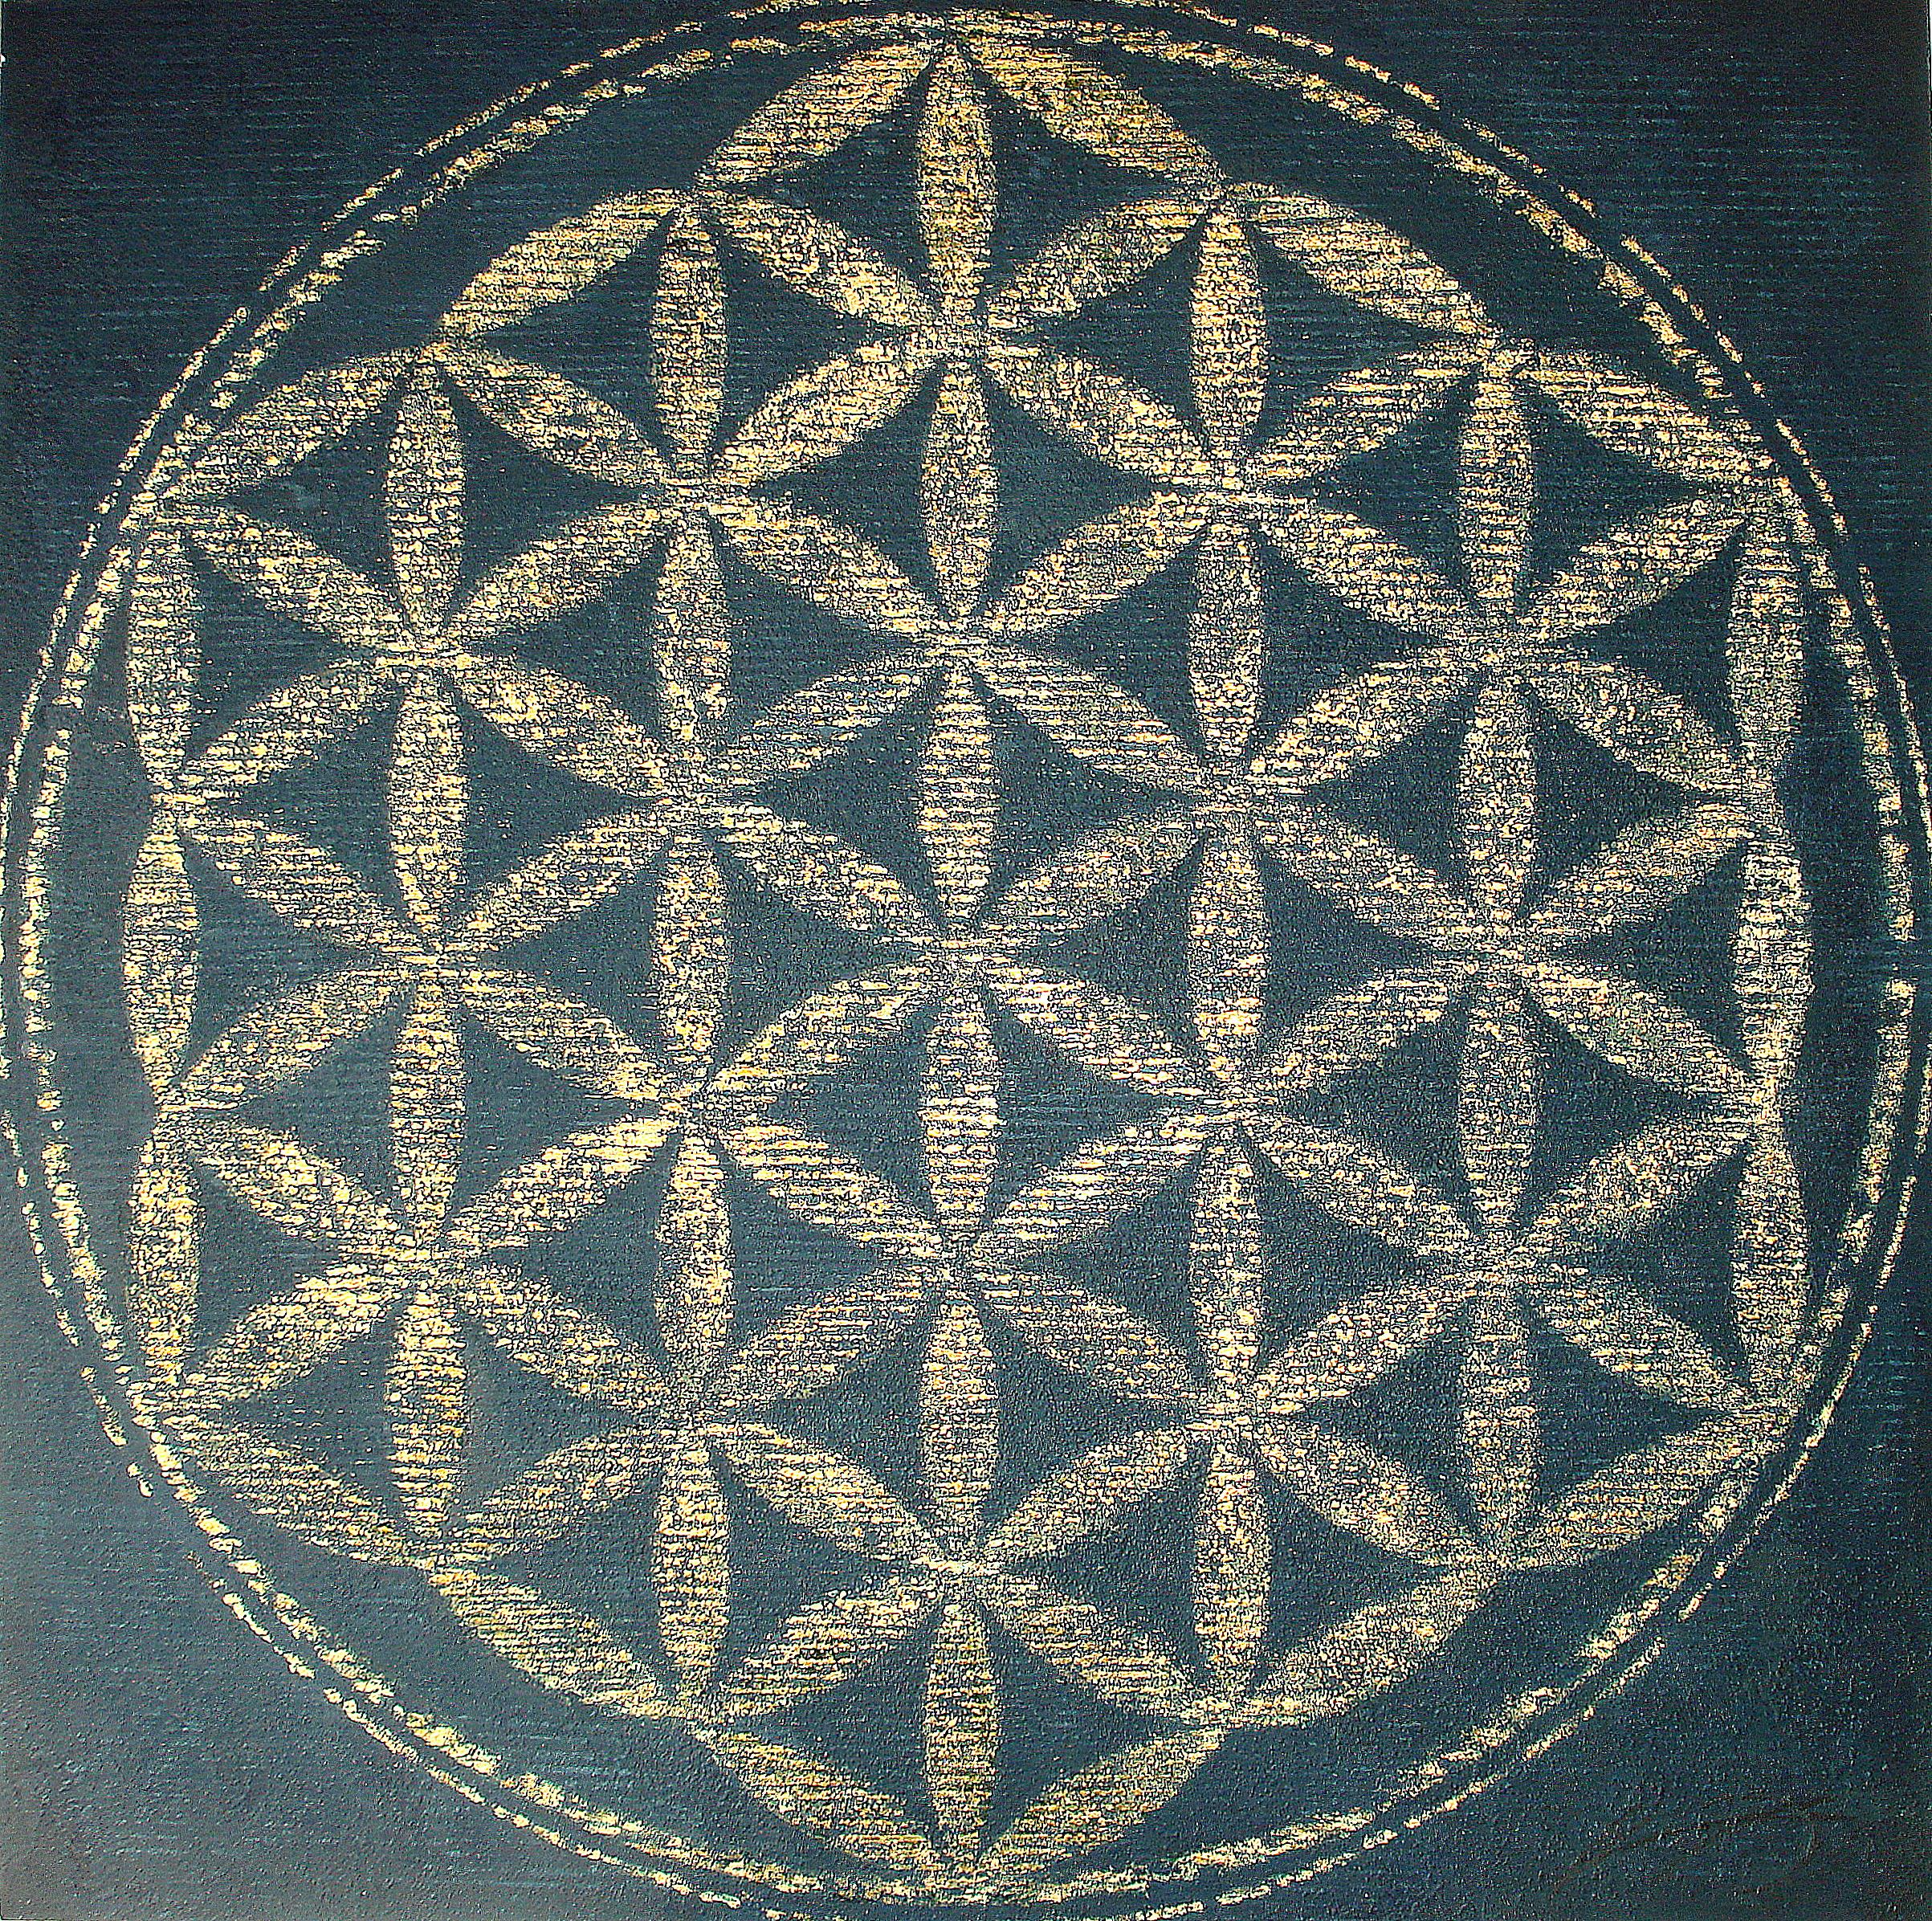 Genesis Pattern – The Flower of Life